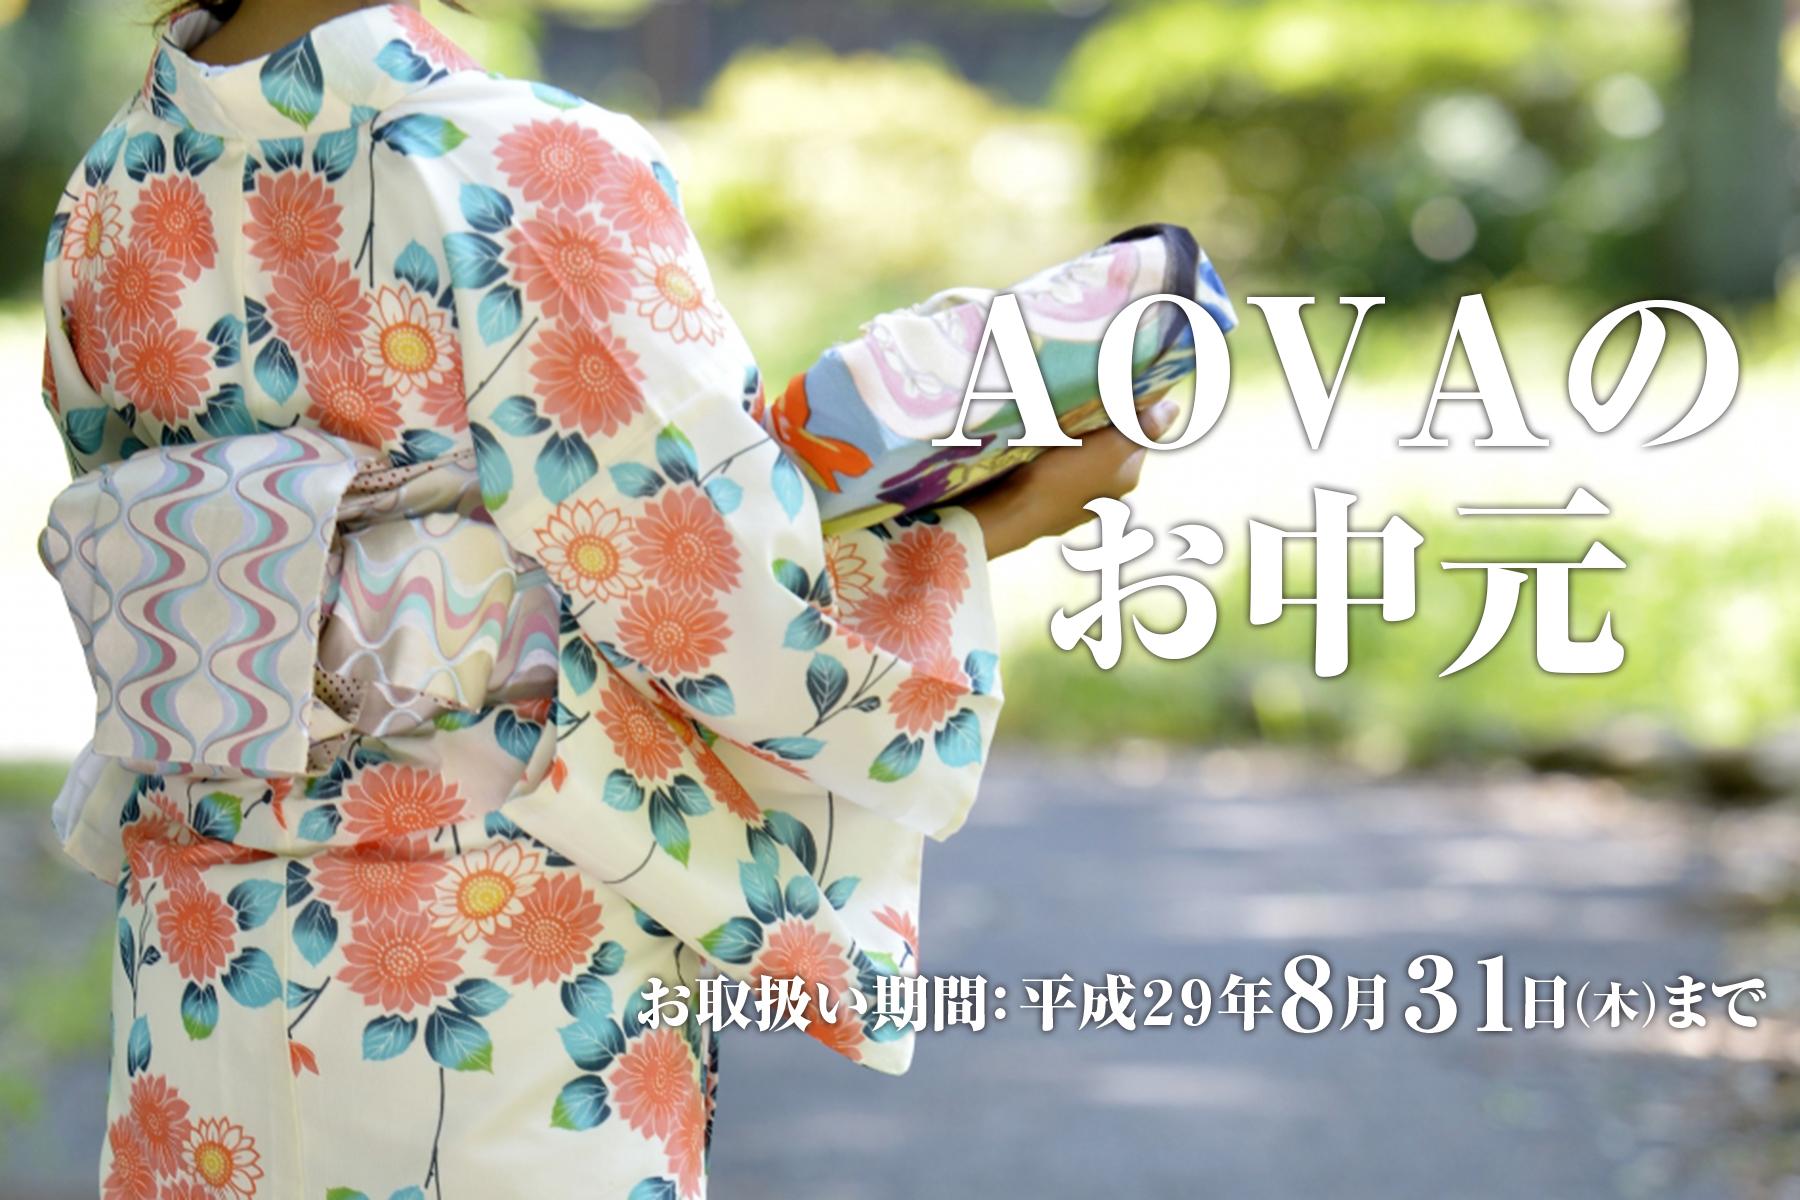 AOVAのお中元のイメージ画